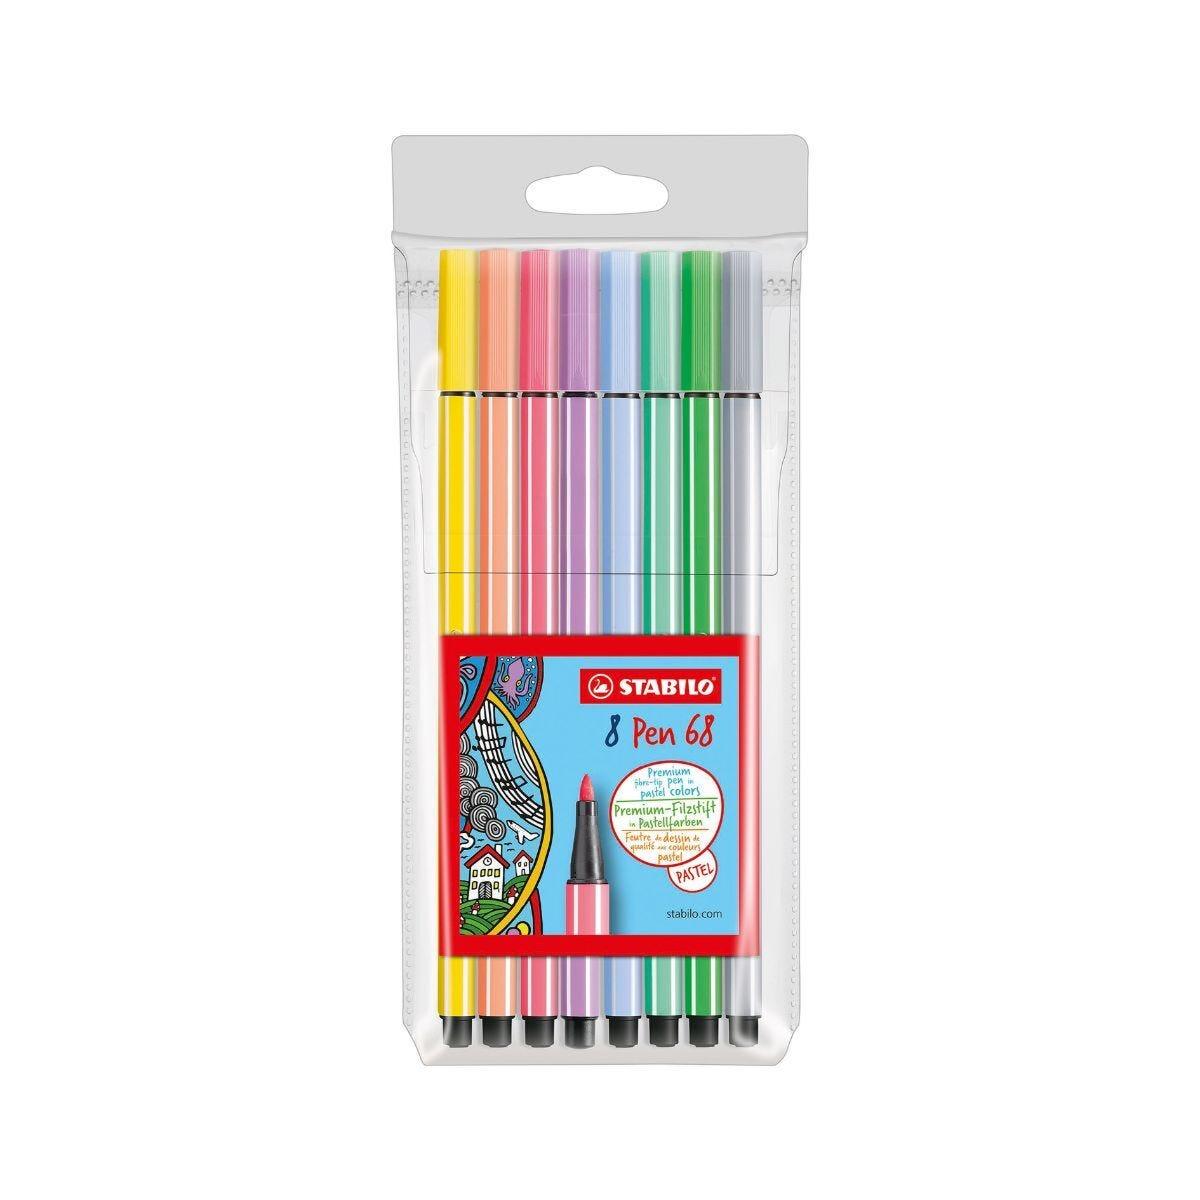 Stabilo Pen 68 Felt Tip Pens Pack Of 8 Pastels Assorted